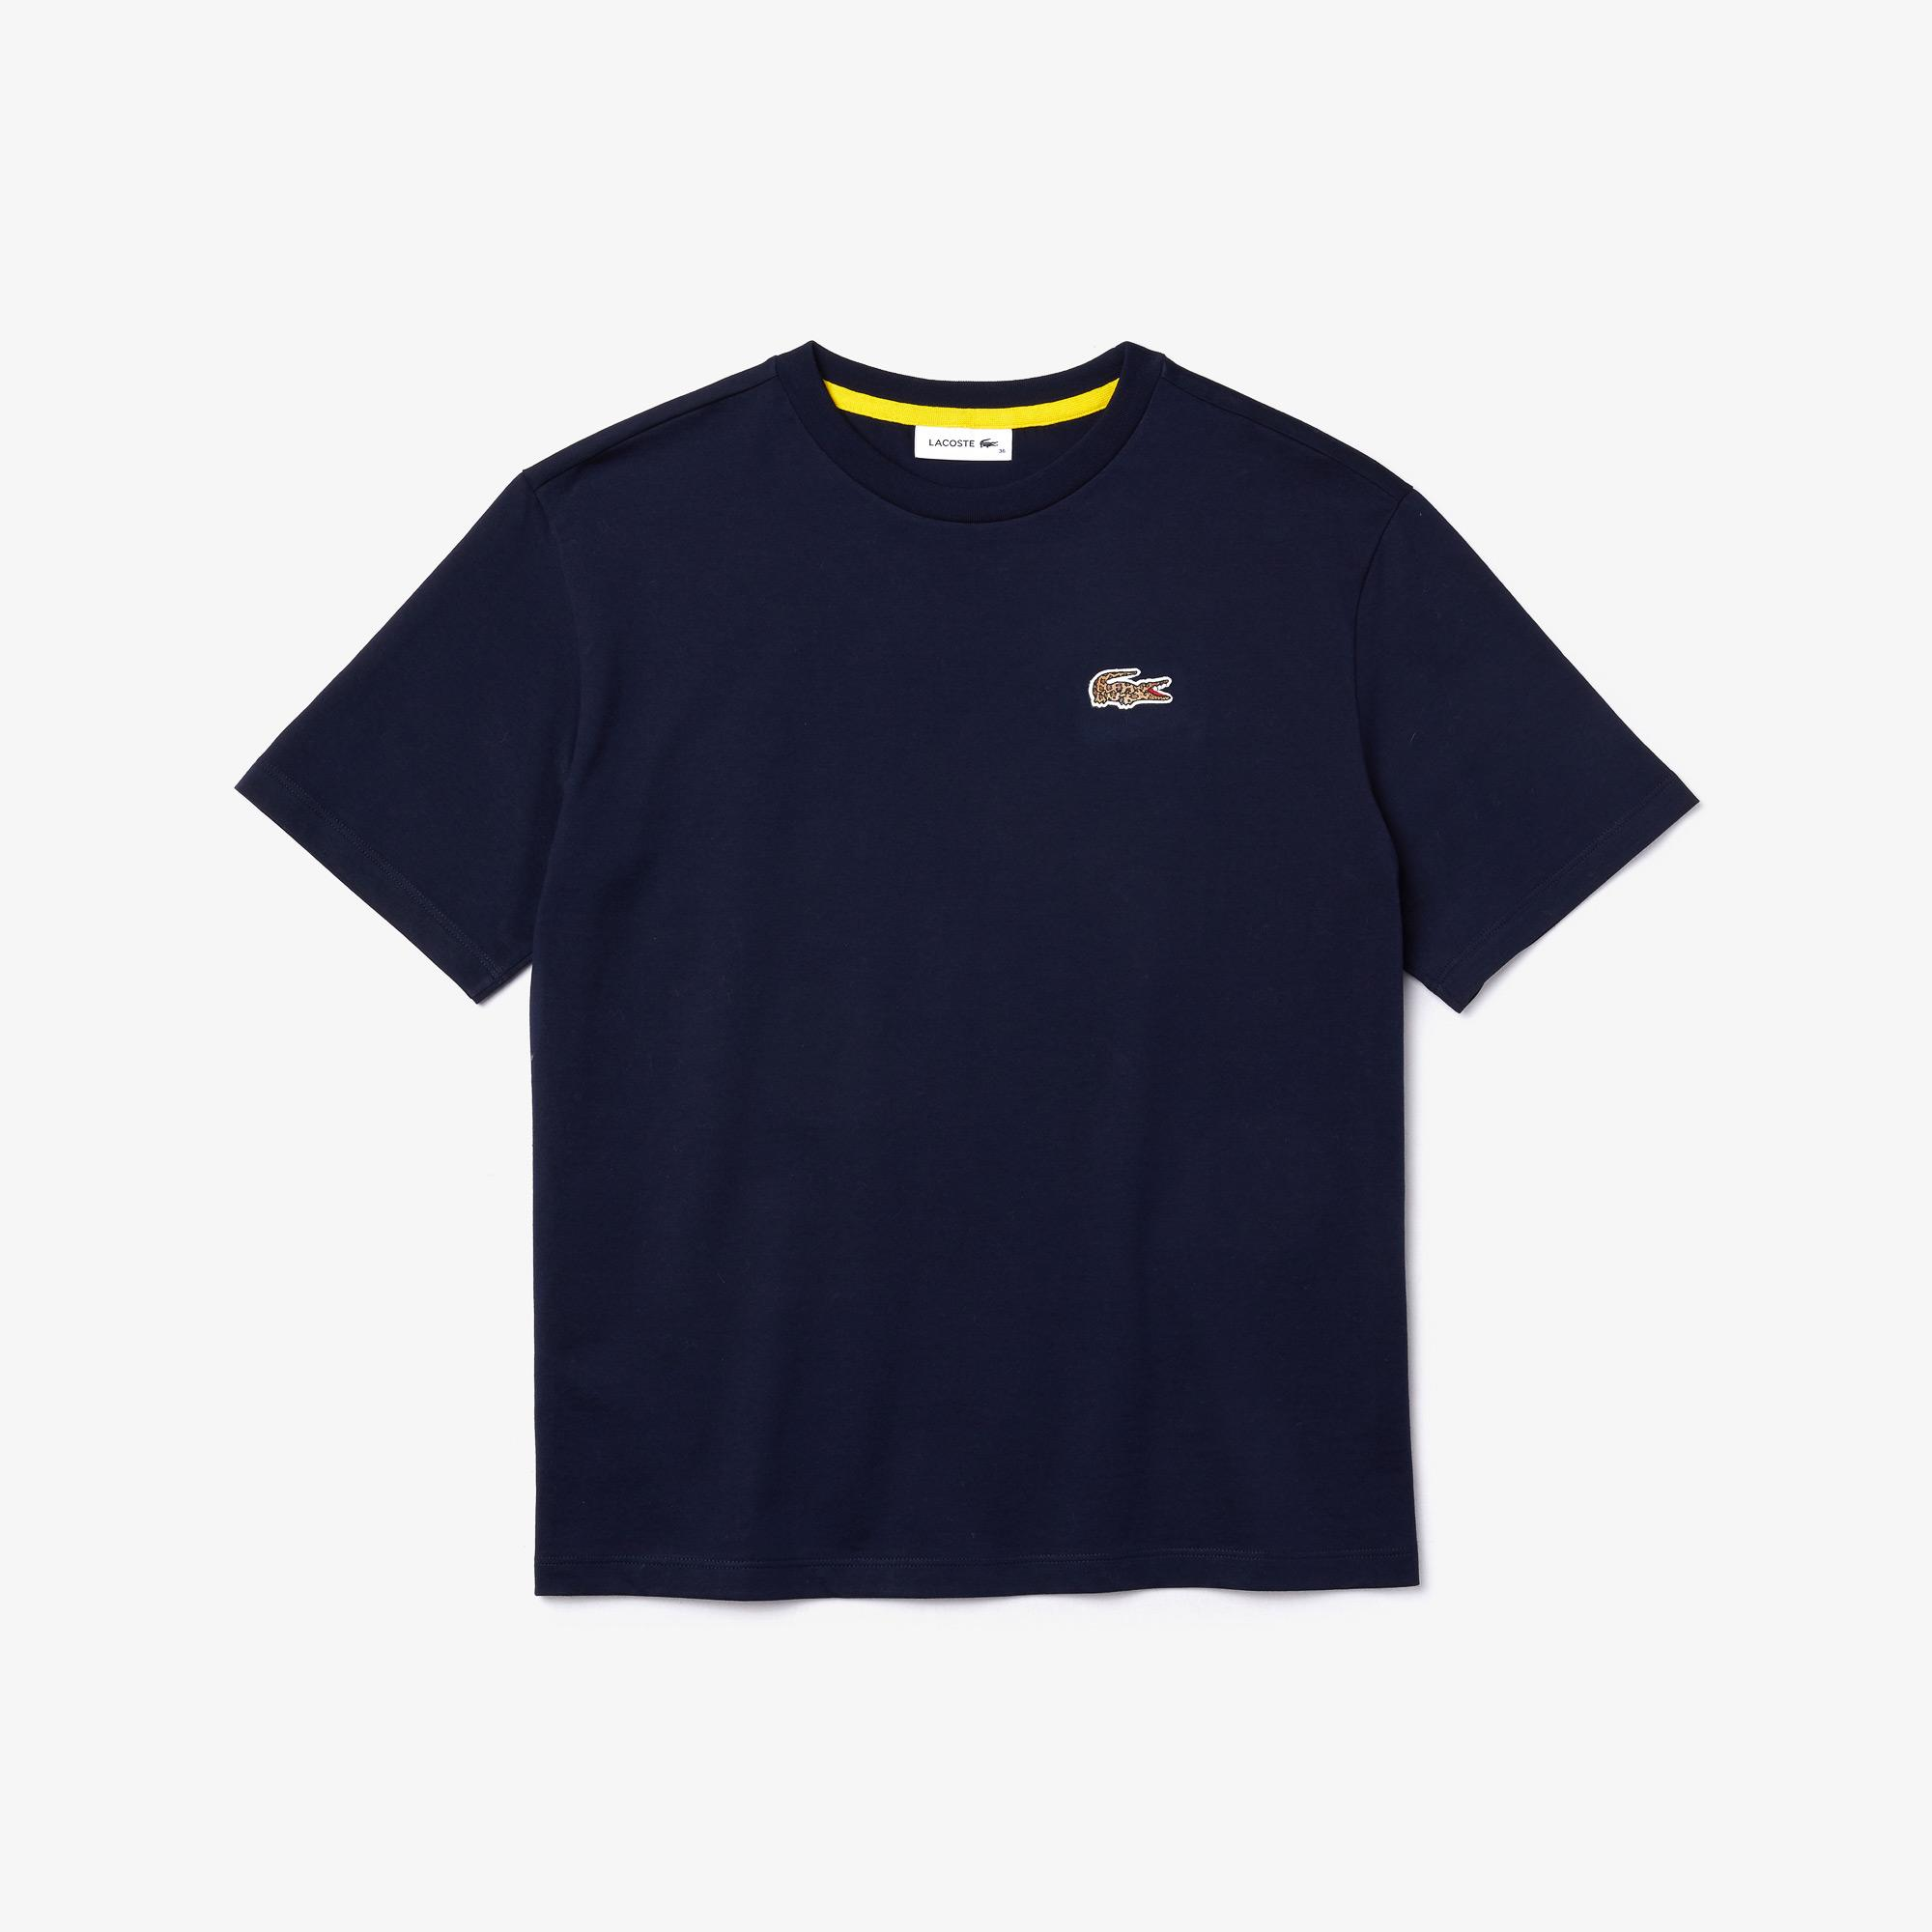 Lacoste x National Geographic Kadın Lacivert T-shirt